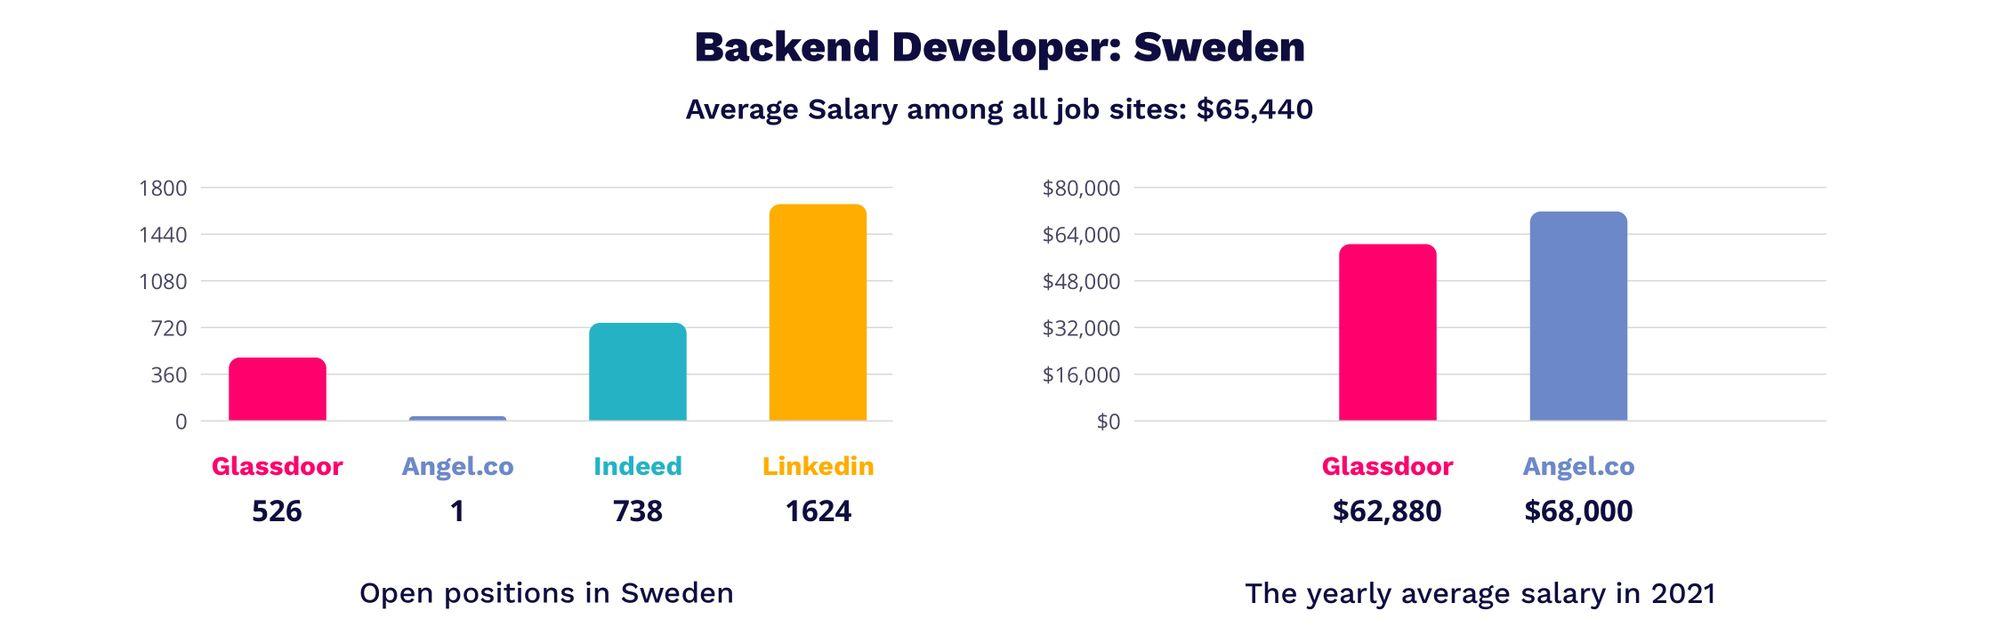 backend developer salaries in Sweden